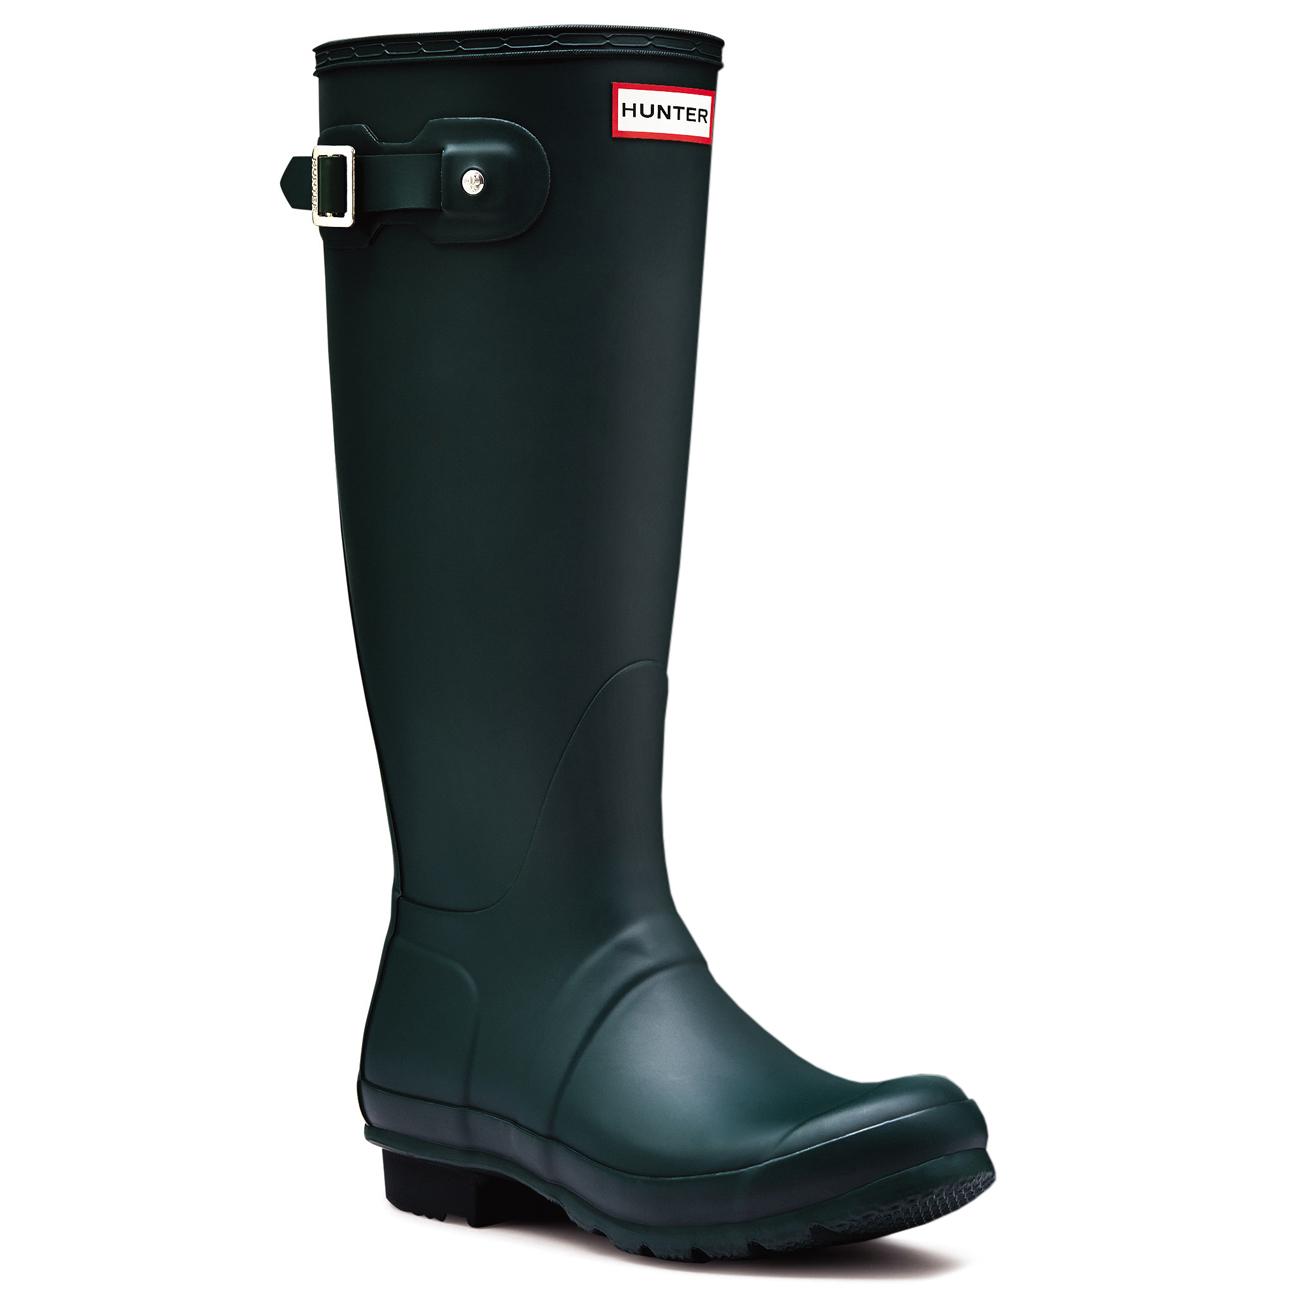 Beautiful Refresh Hunter-03 Womenu0026#39;s Lace Up Waterproof Duck Mid Calf Rain Winter Boots | EBay